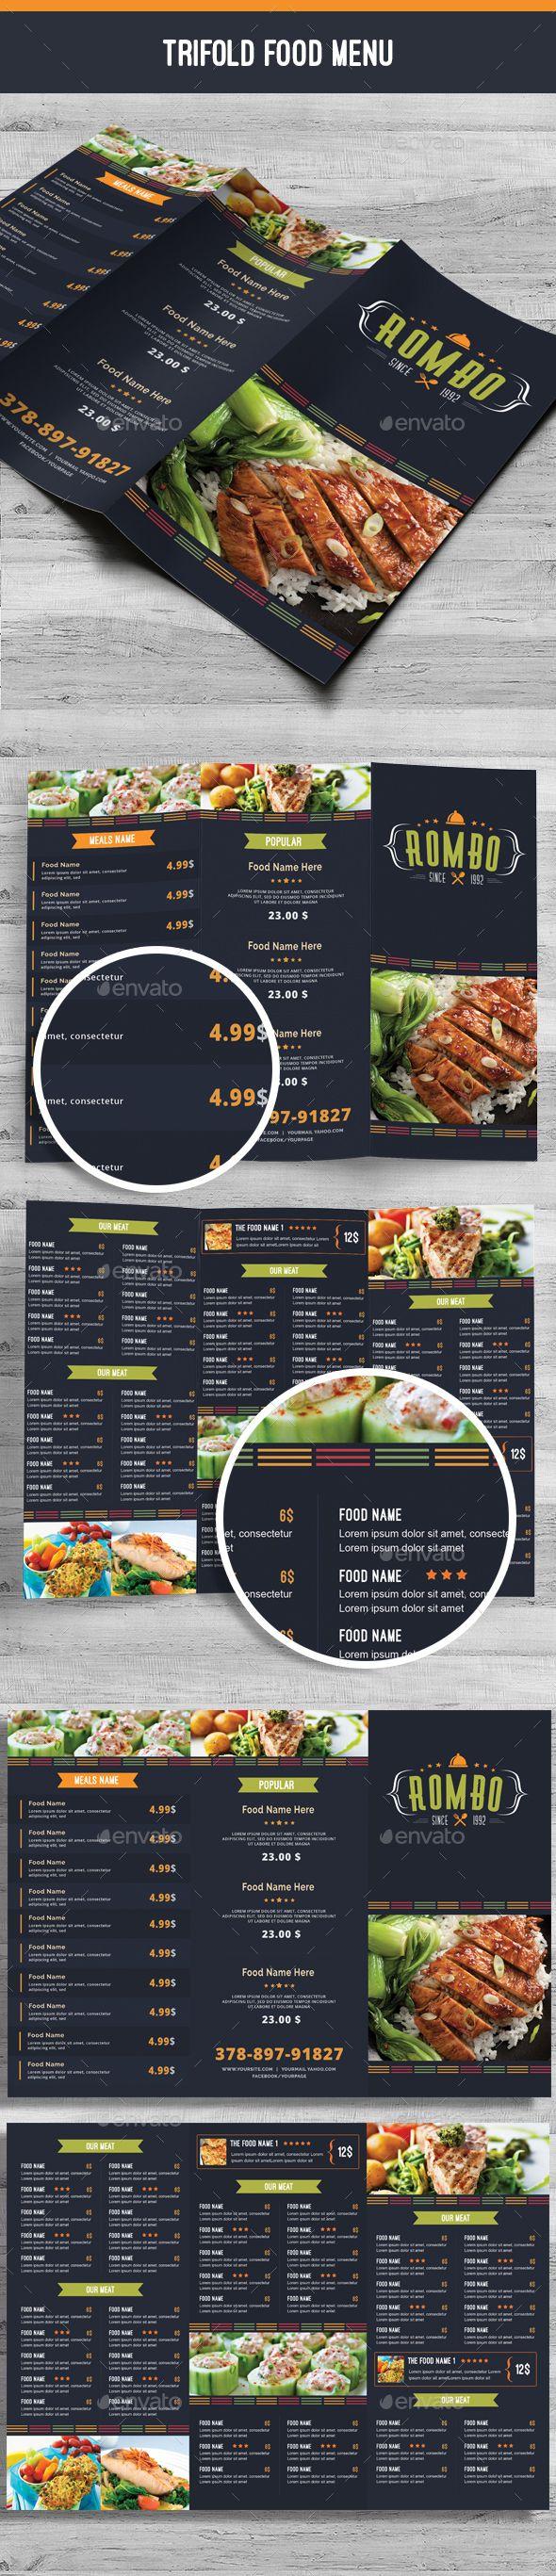 455 best Trifold Restaurant Menu Template images on Pinterest ...